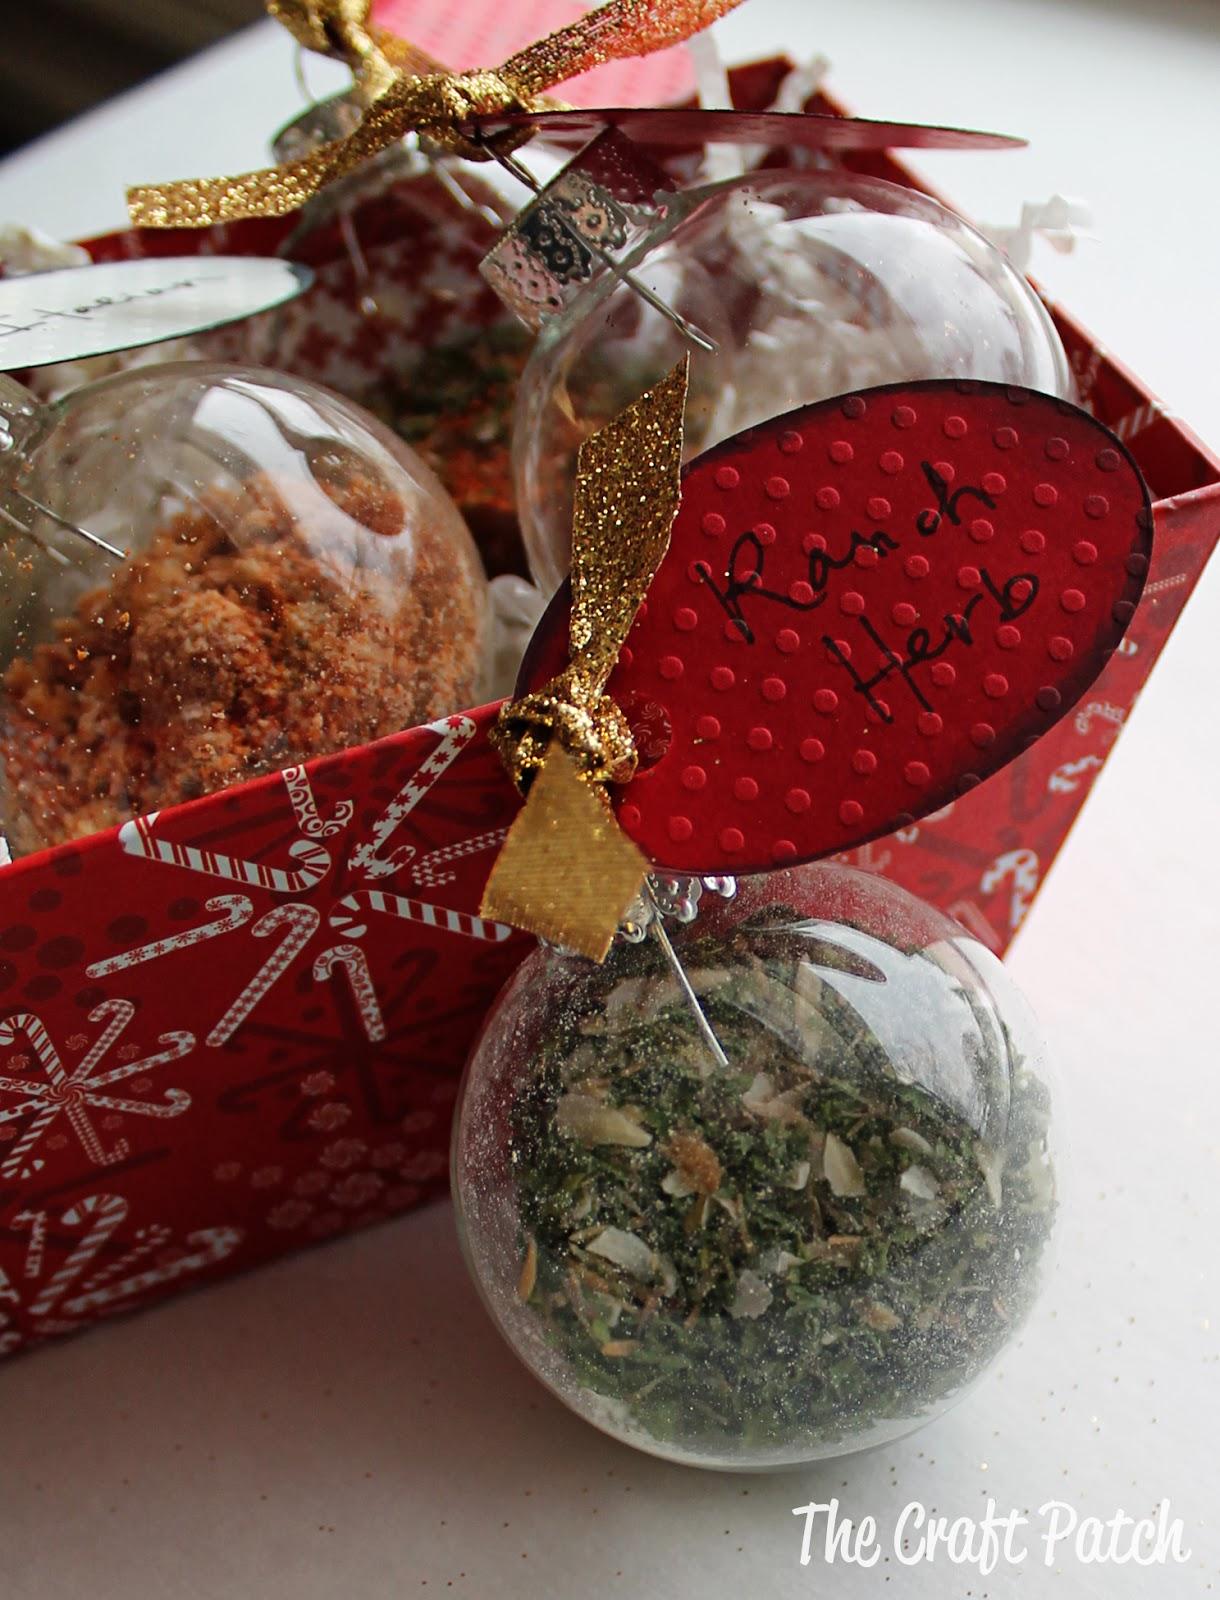 The Craft Patch: Herb Dip Seasonings Christmas Gift